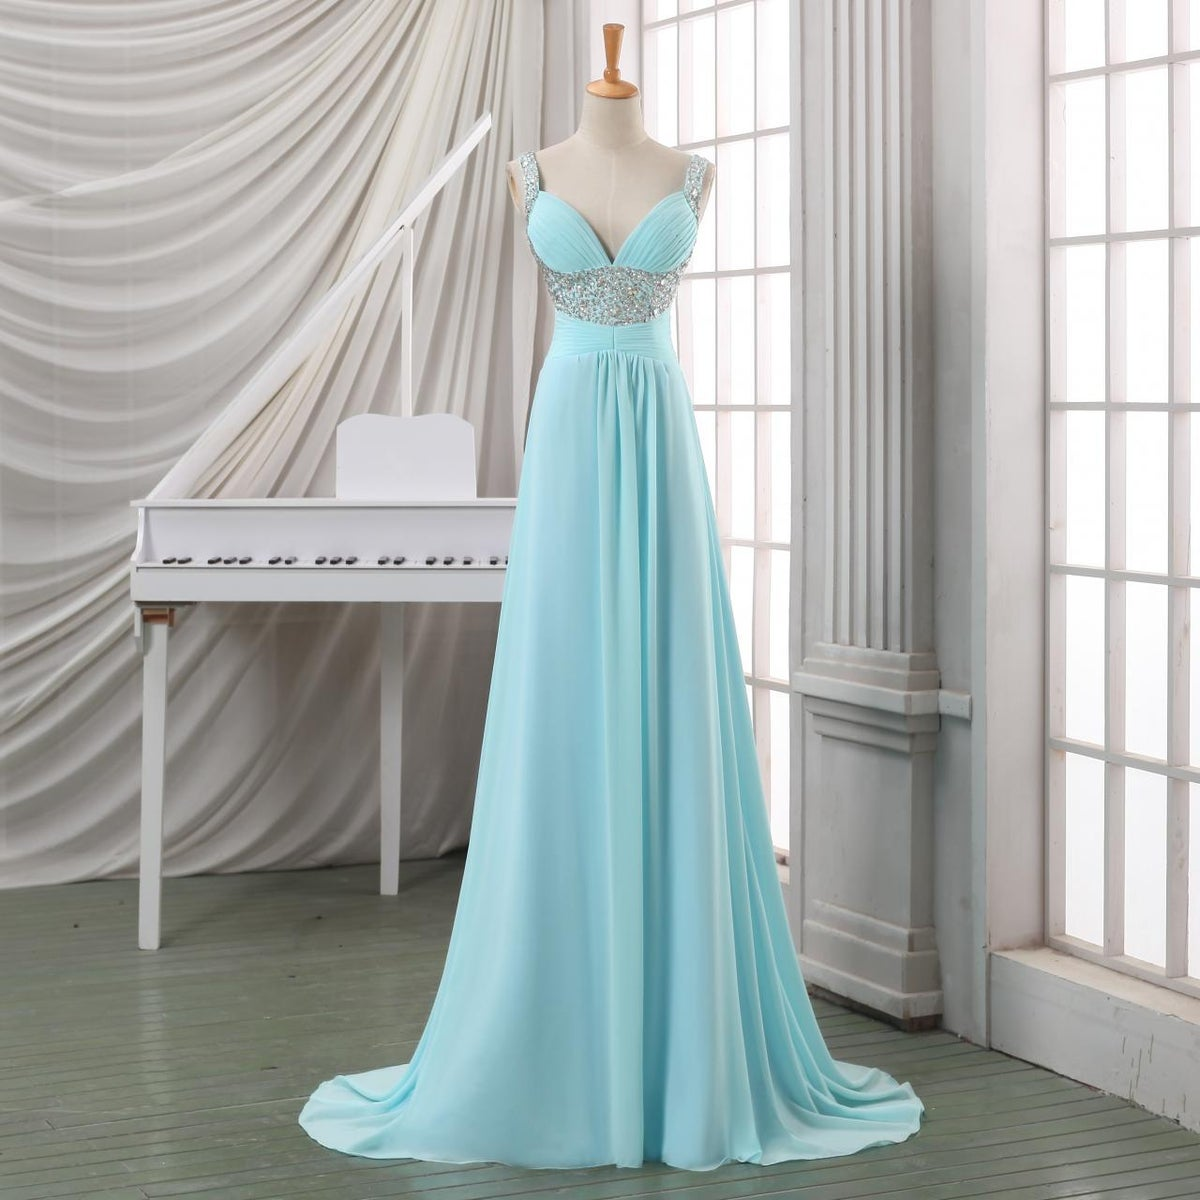 Elegant Blue Beaded Straps Chiffon Long Party Dress, Blue Prom Dress